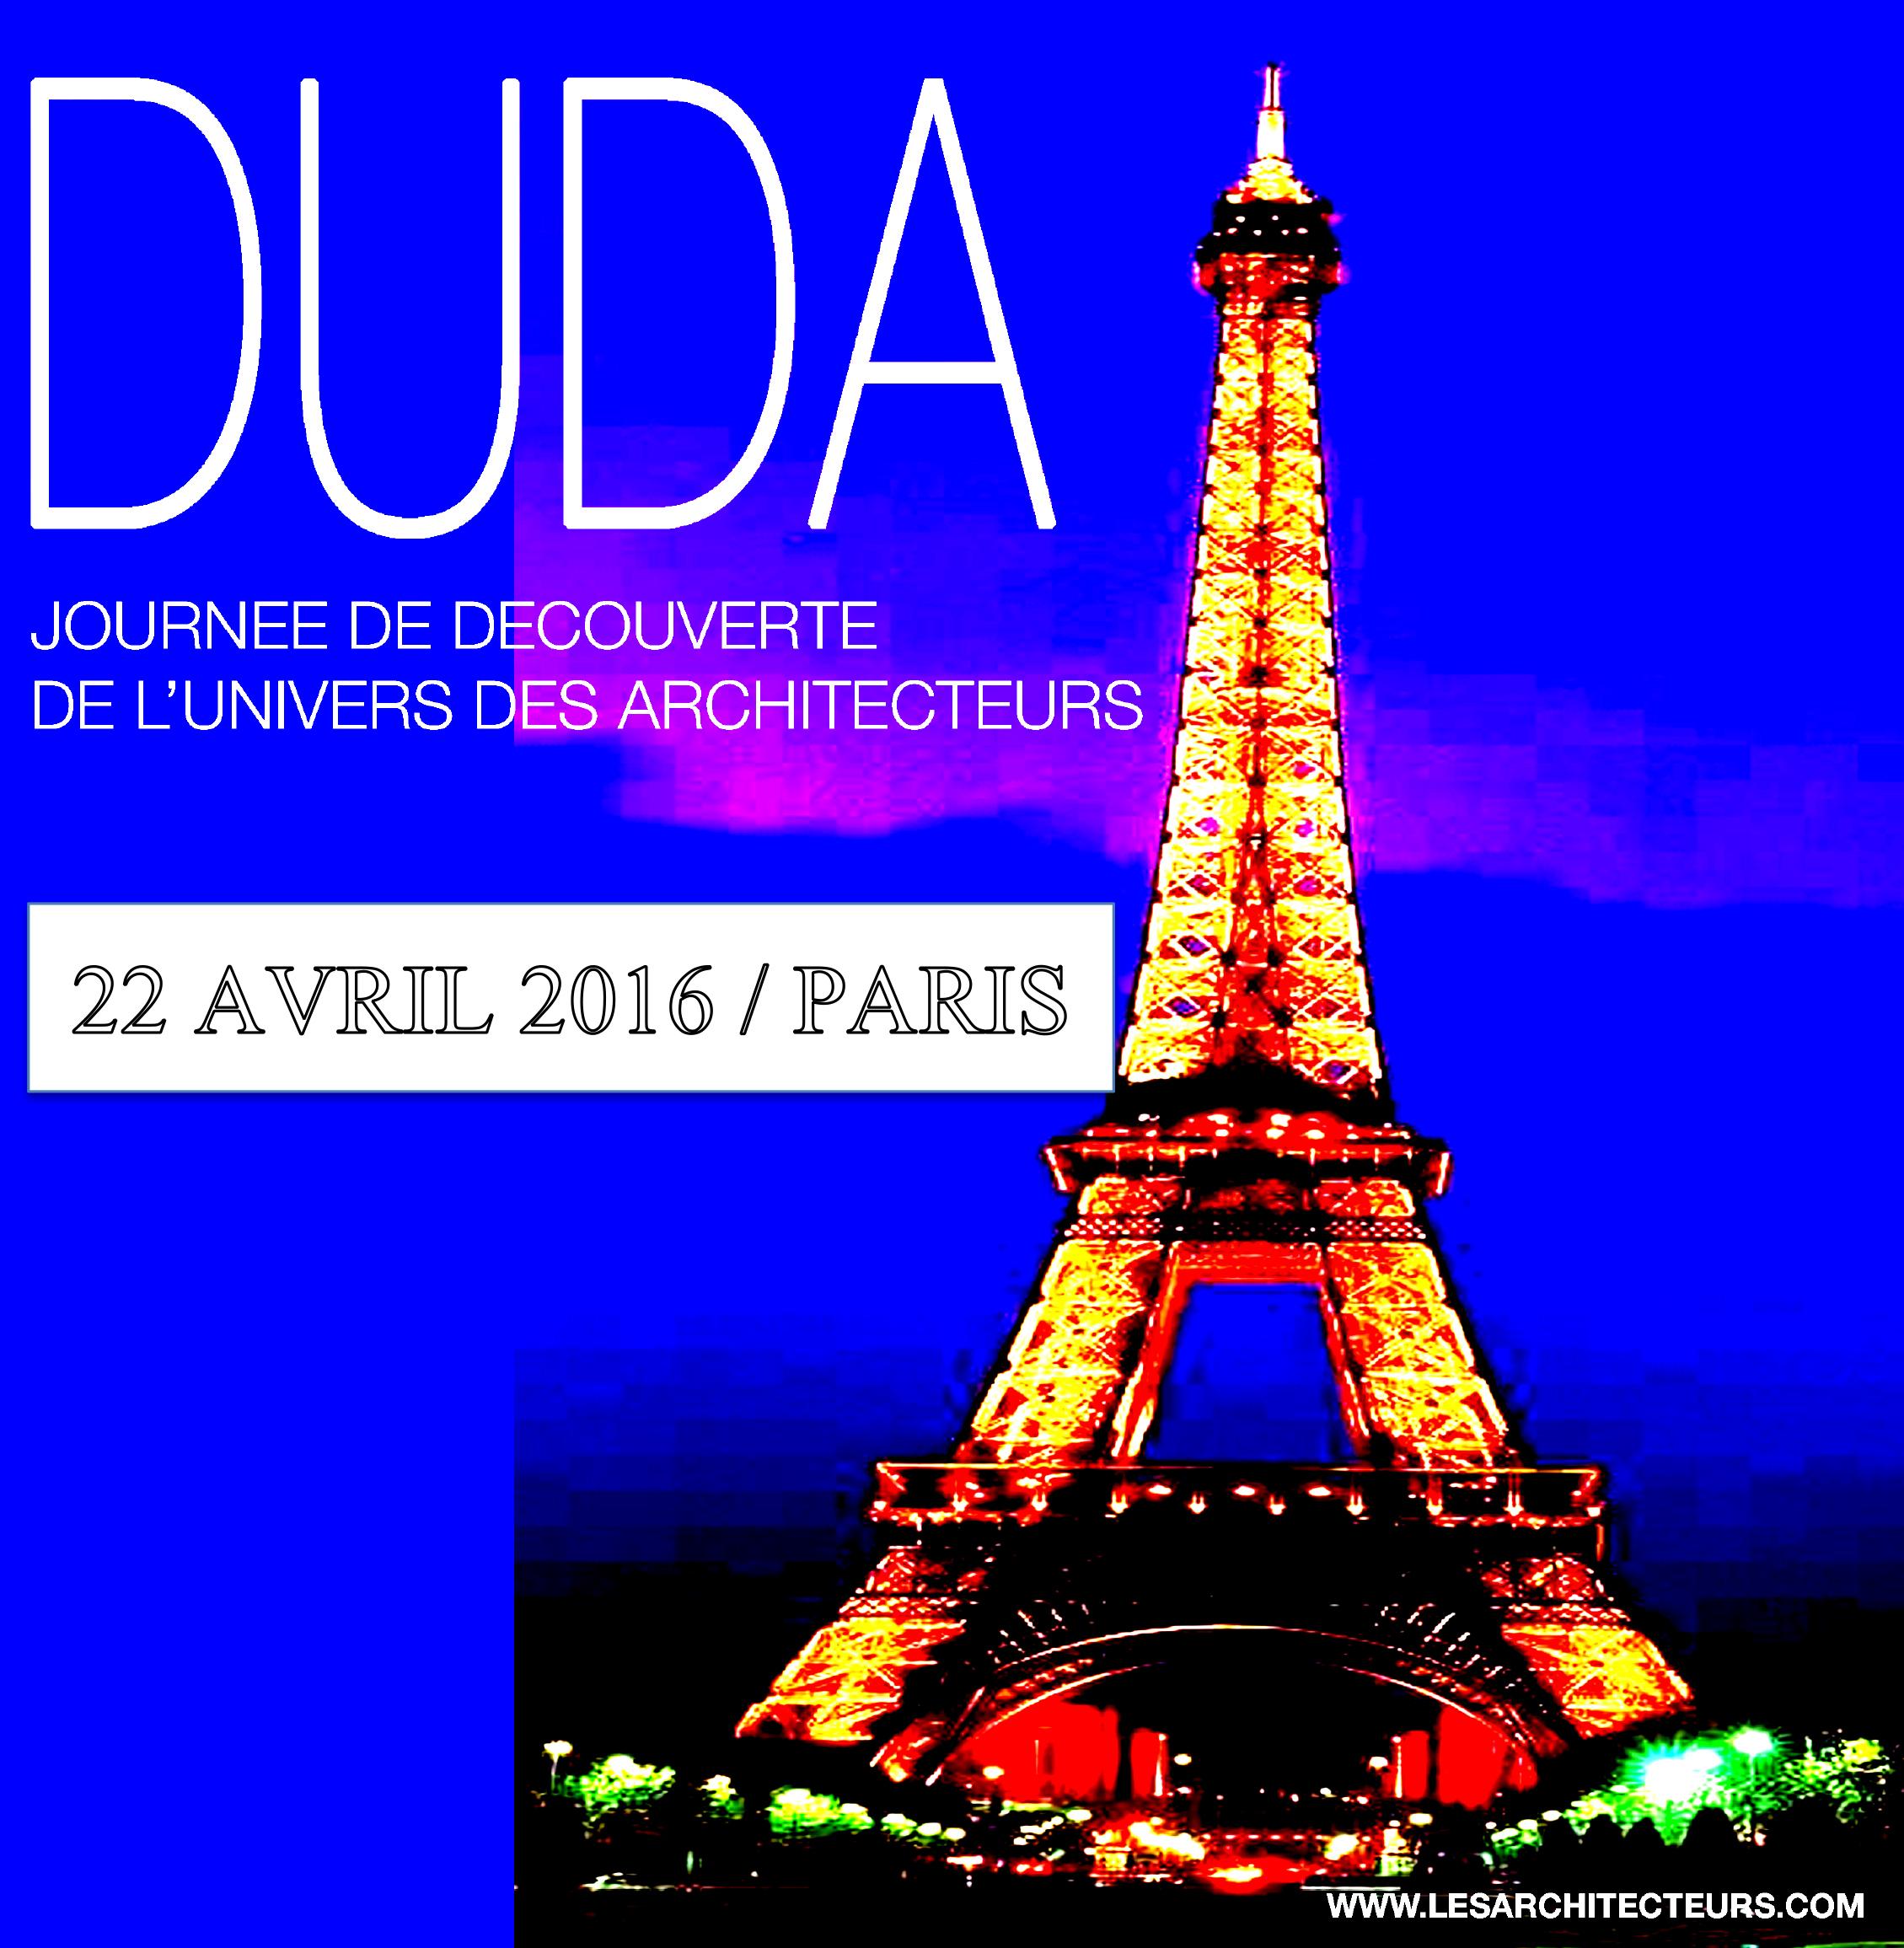 Microsoft Word - 2016 DUDA AVRIL 22.docx